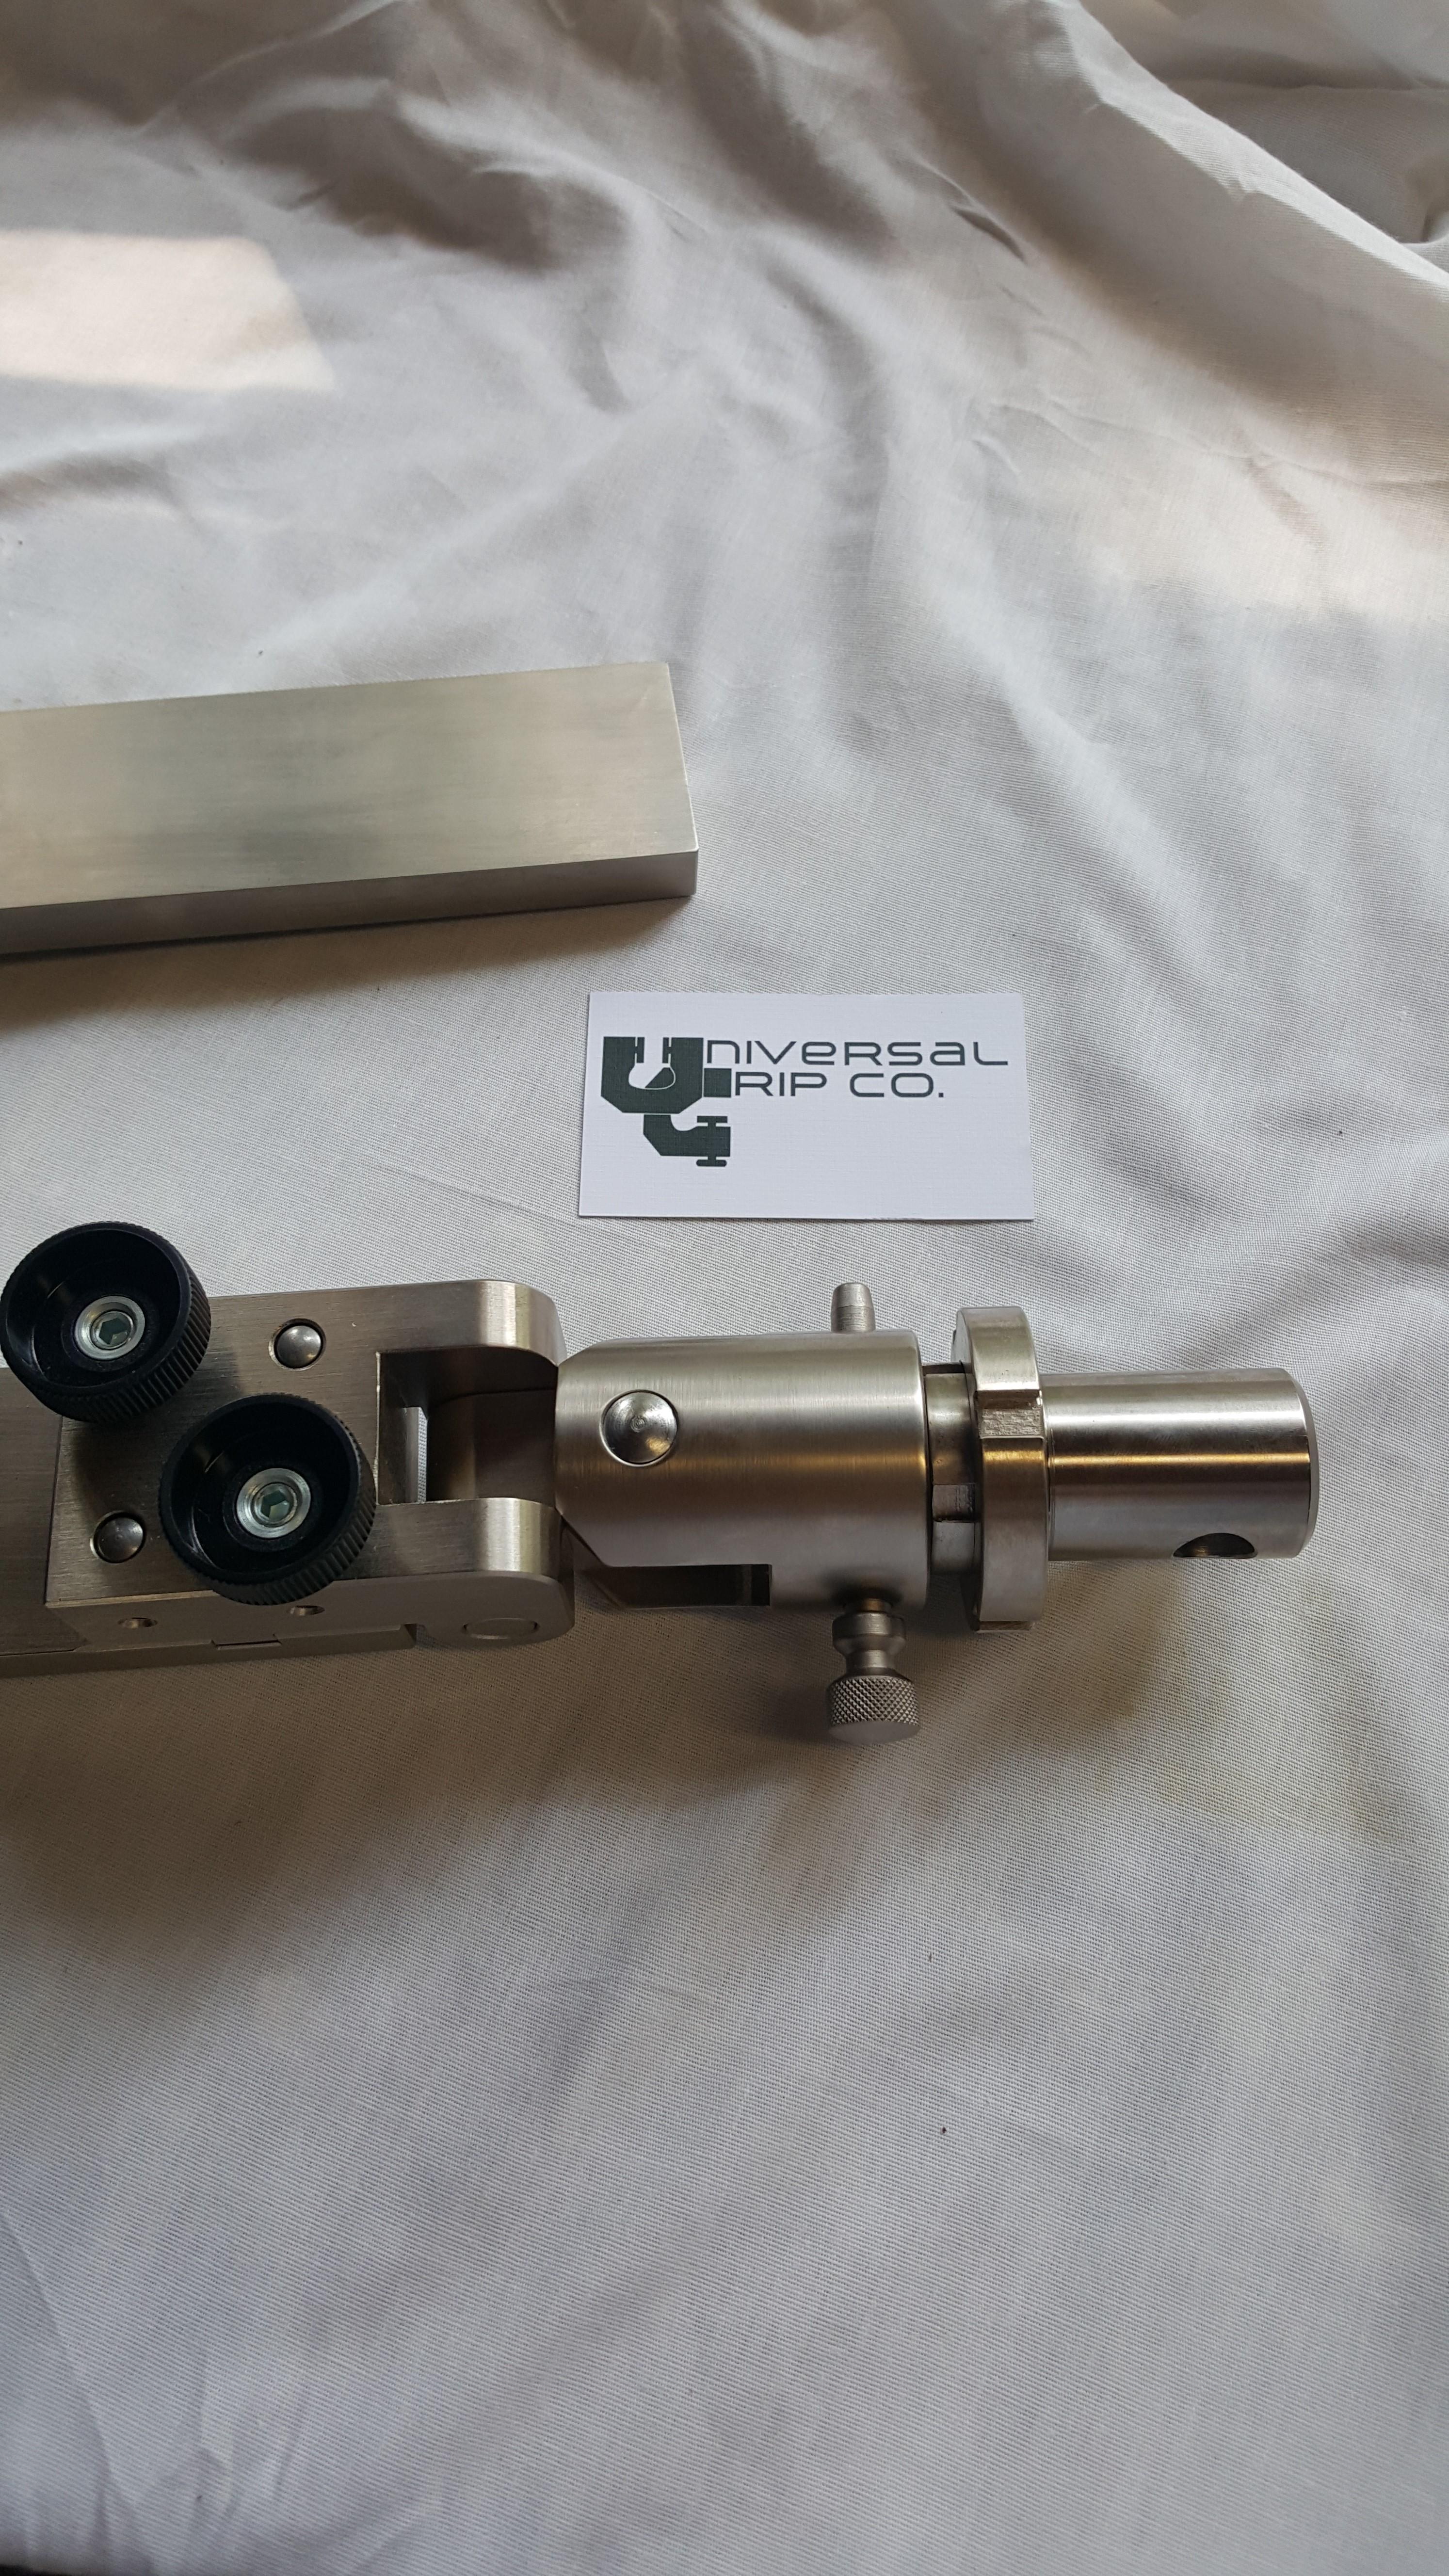 ASTM C273 Shear Fixture (10)